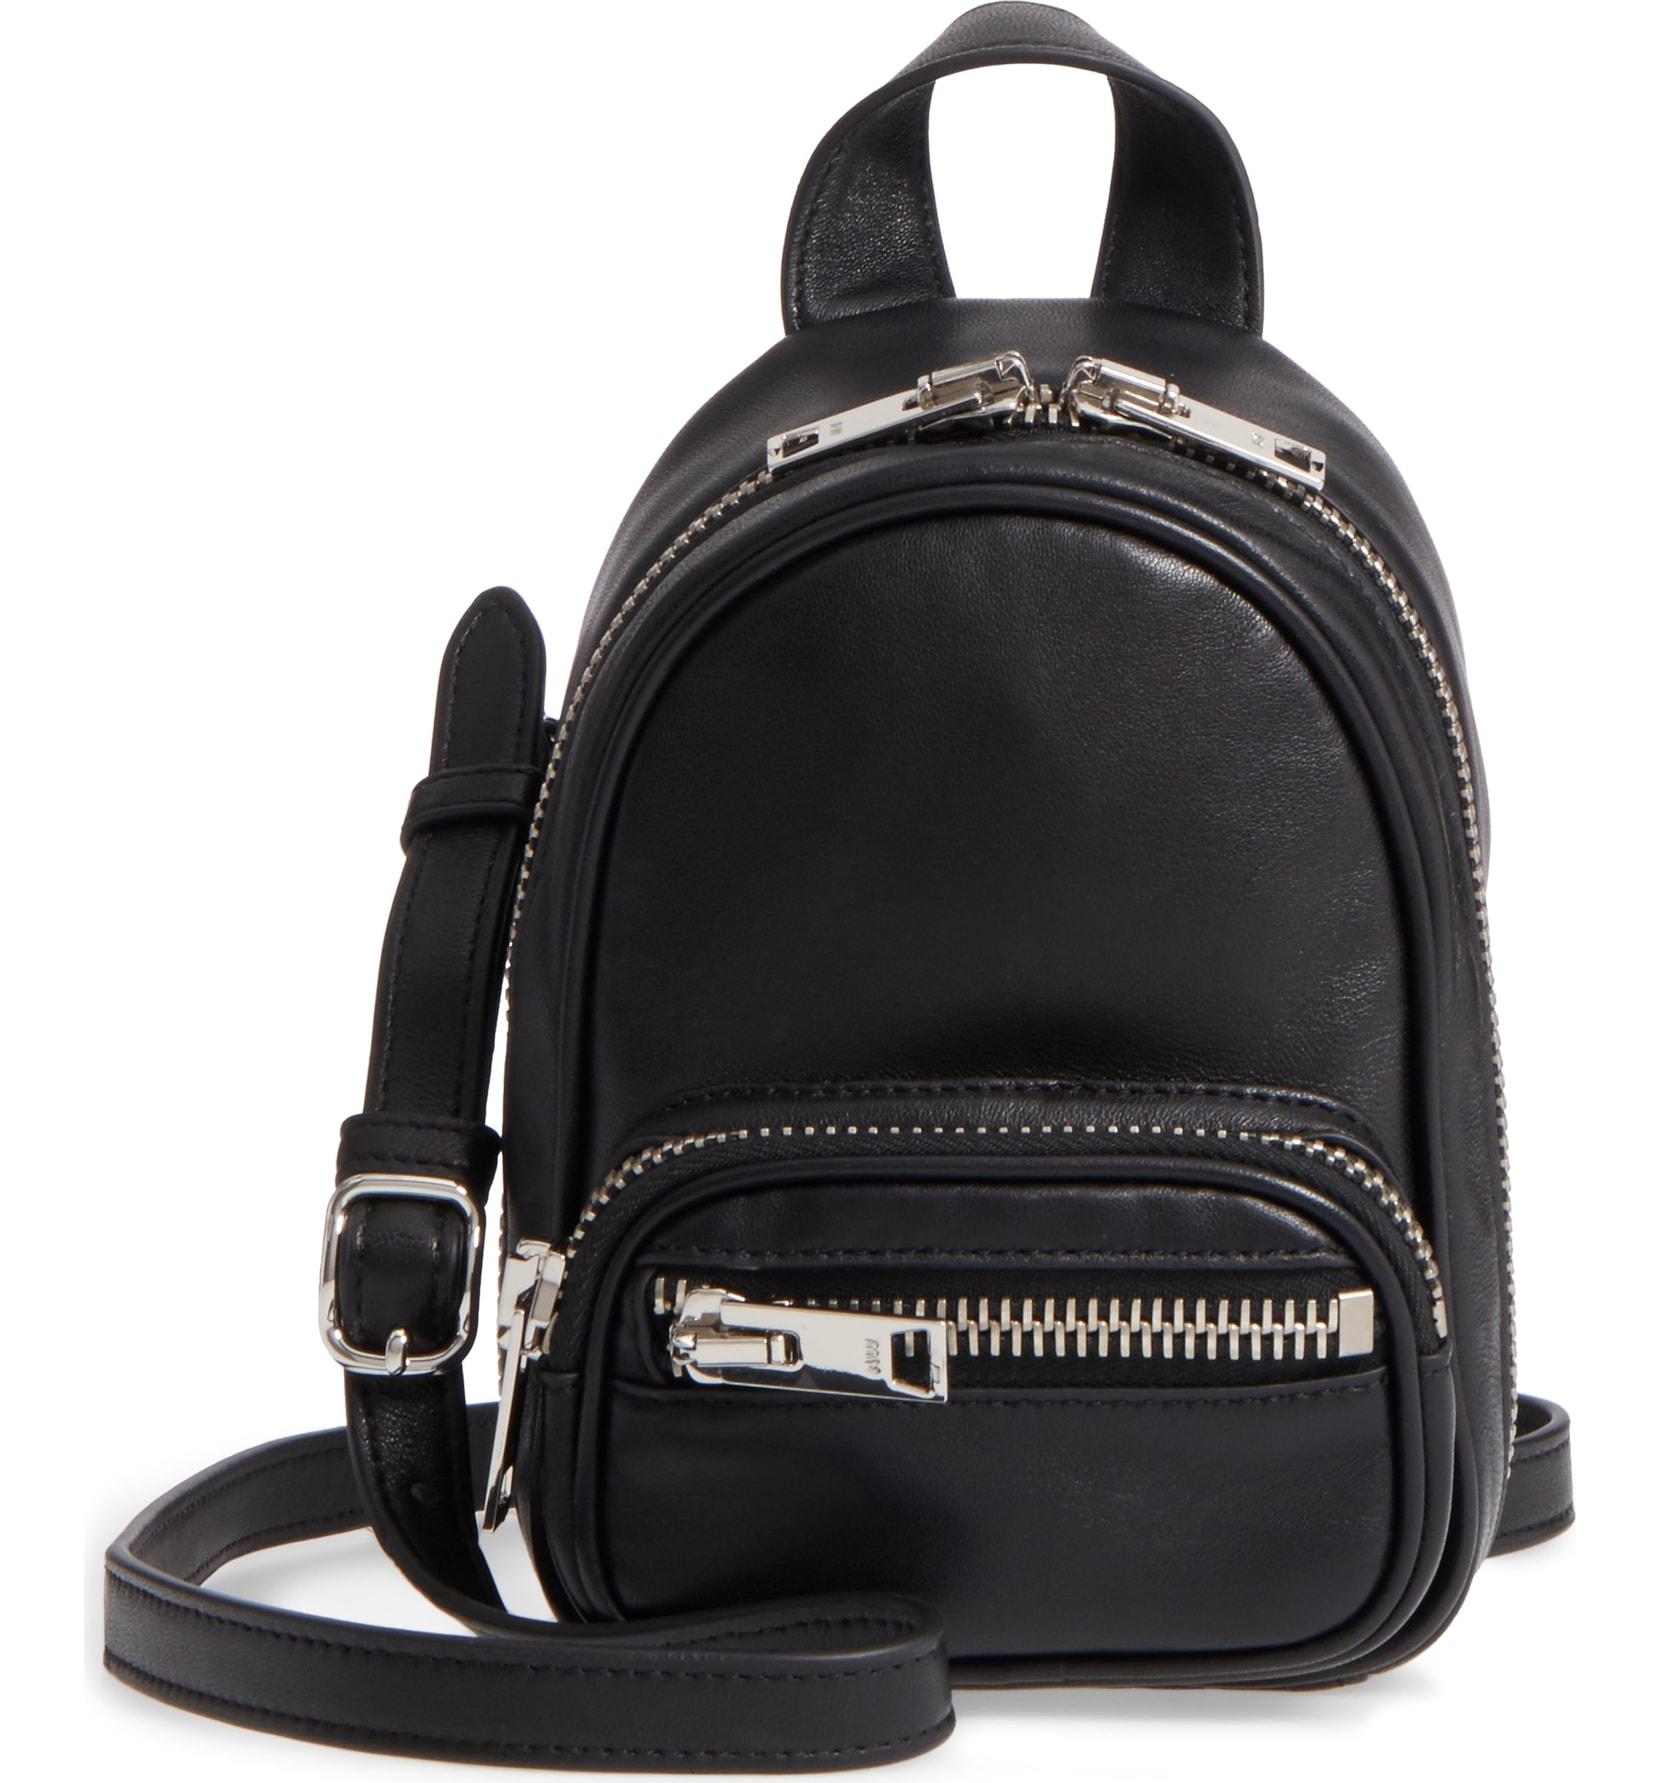 9baab198698 Stylish Mini Backpacks - CEAGESP